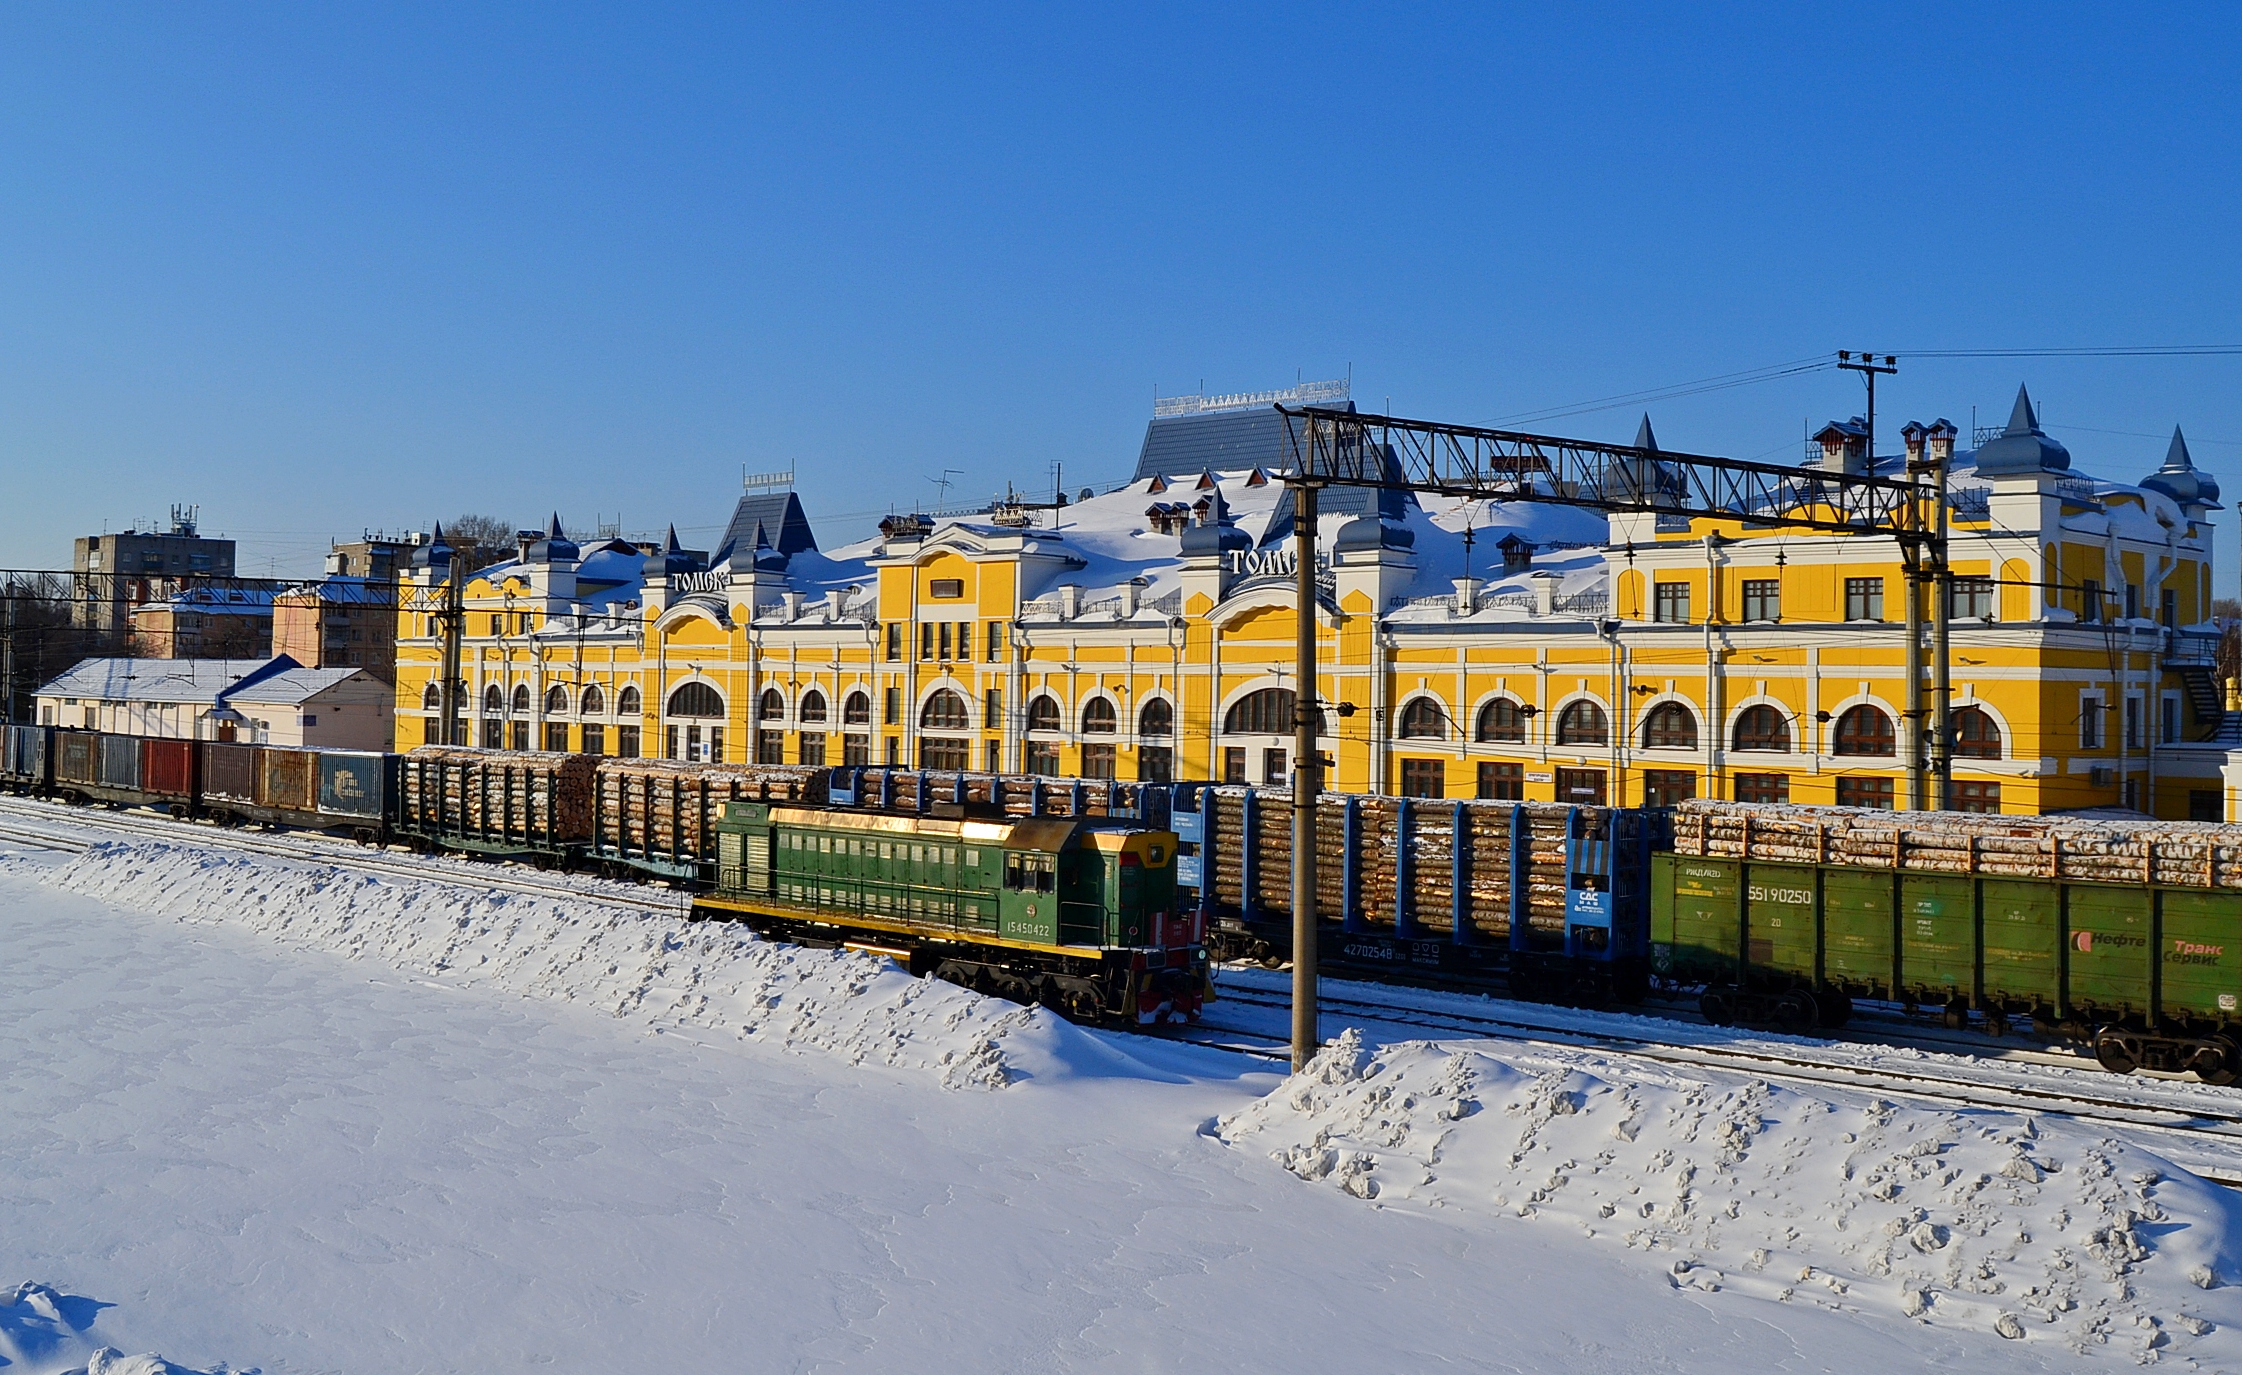 Фото вокзала томска